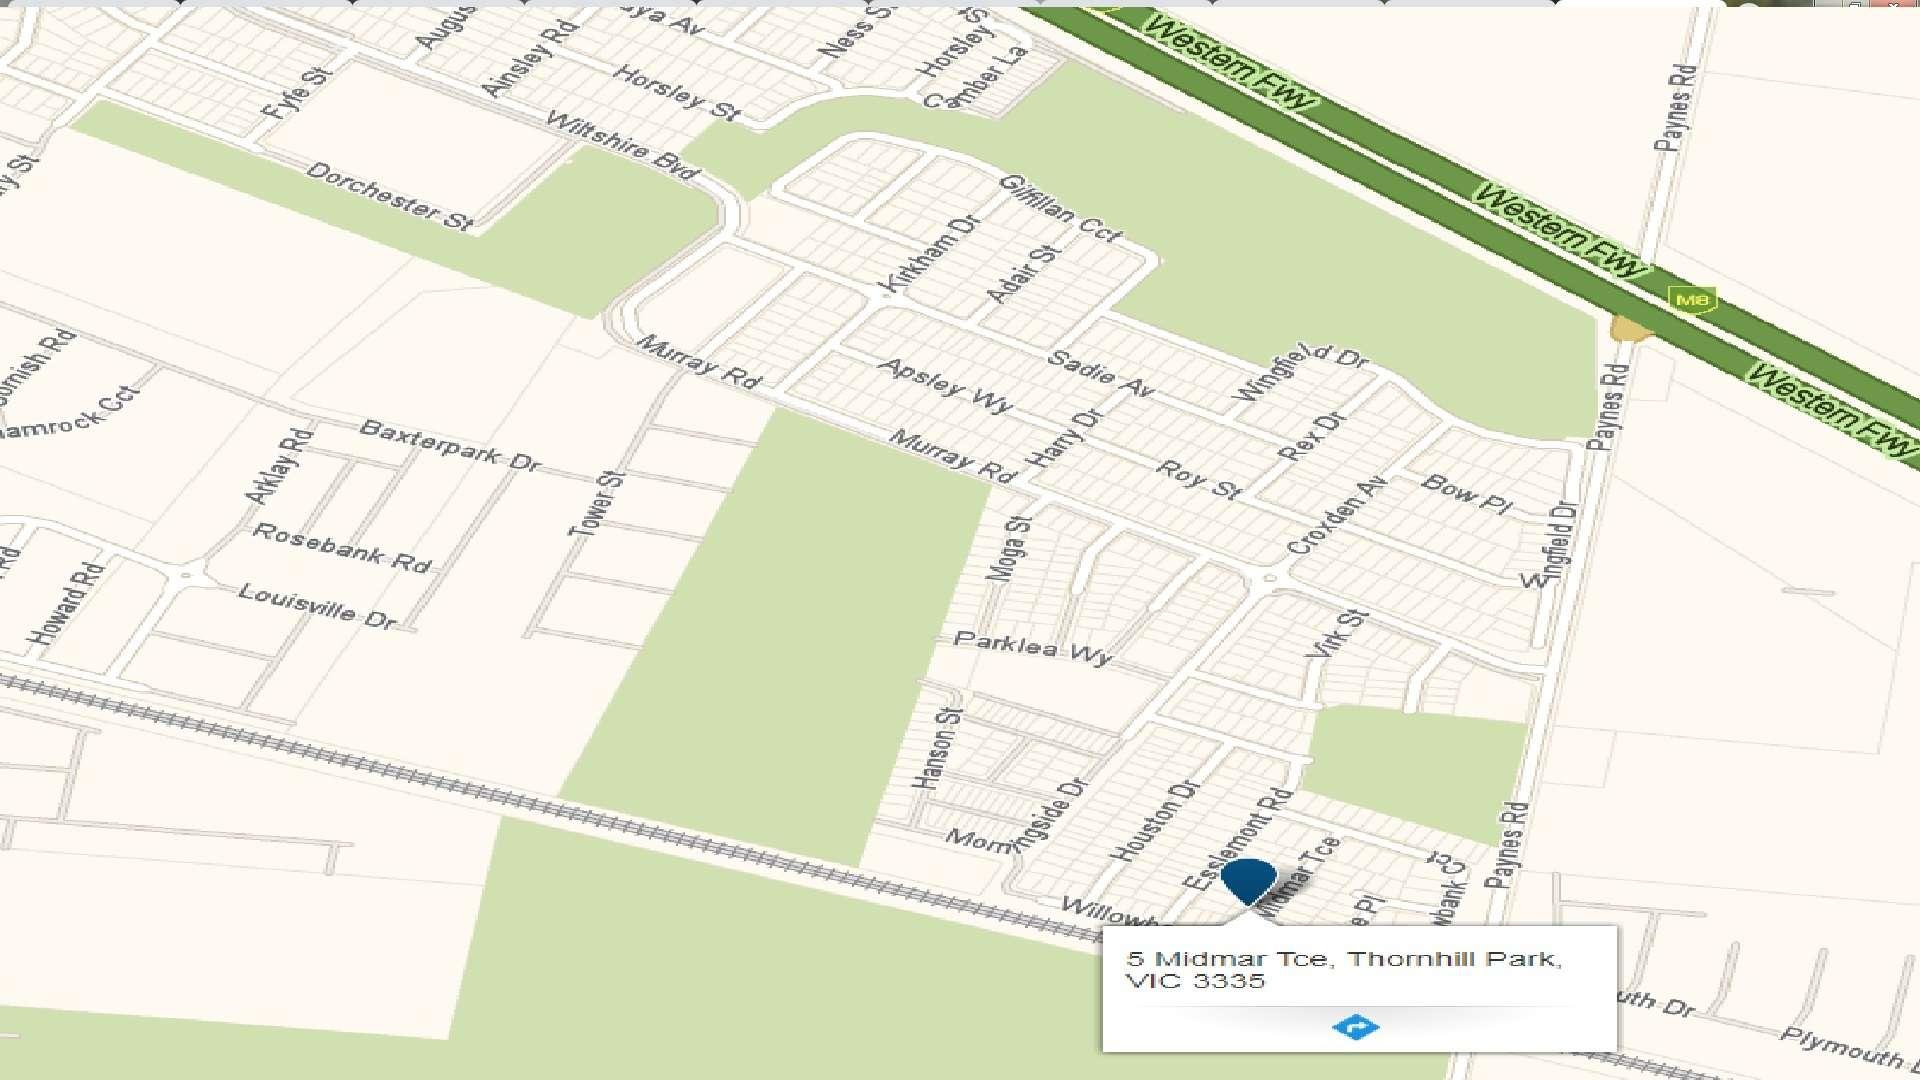 5 Midmar Terrace, THORNHILL PARK, VIC 3335